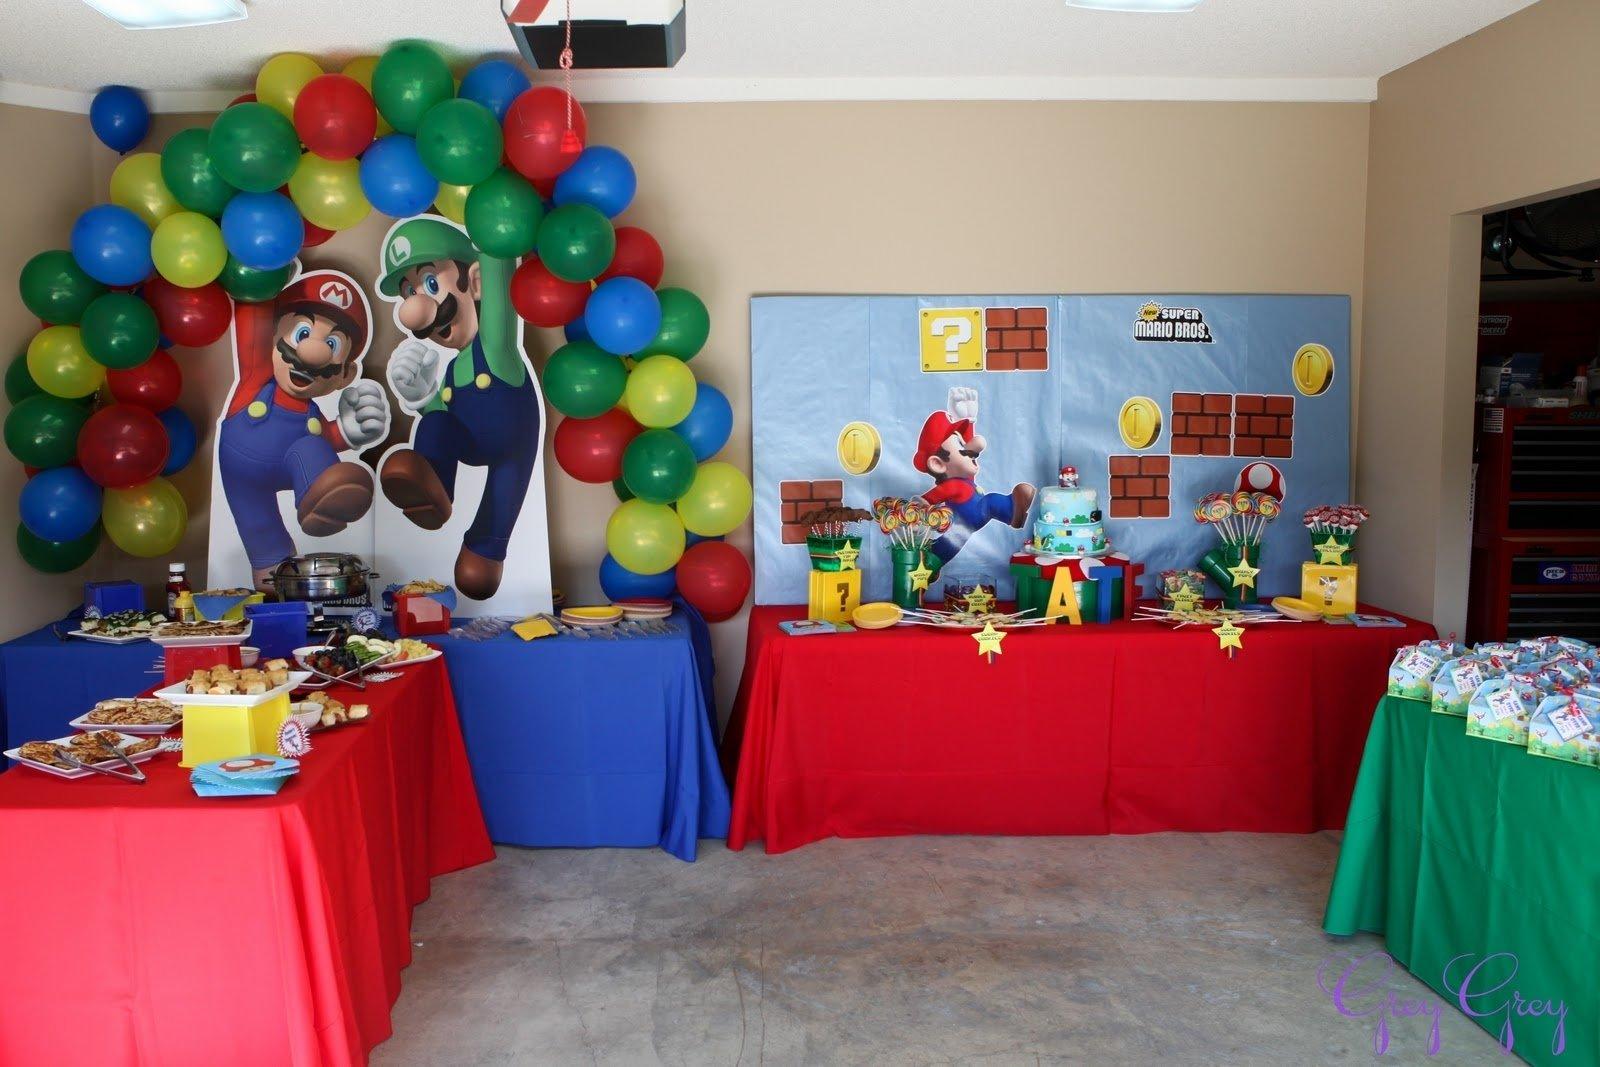 10 Stylish Super Mario Bros Birthday Party Ideas greygrey designs my parties super mario birthday party 4 2020